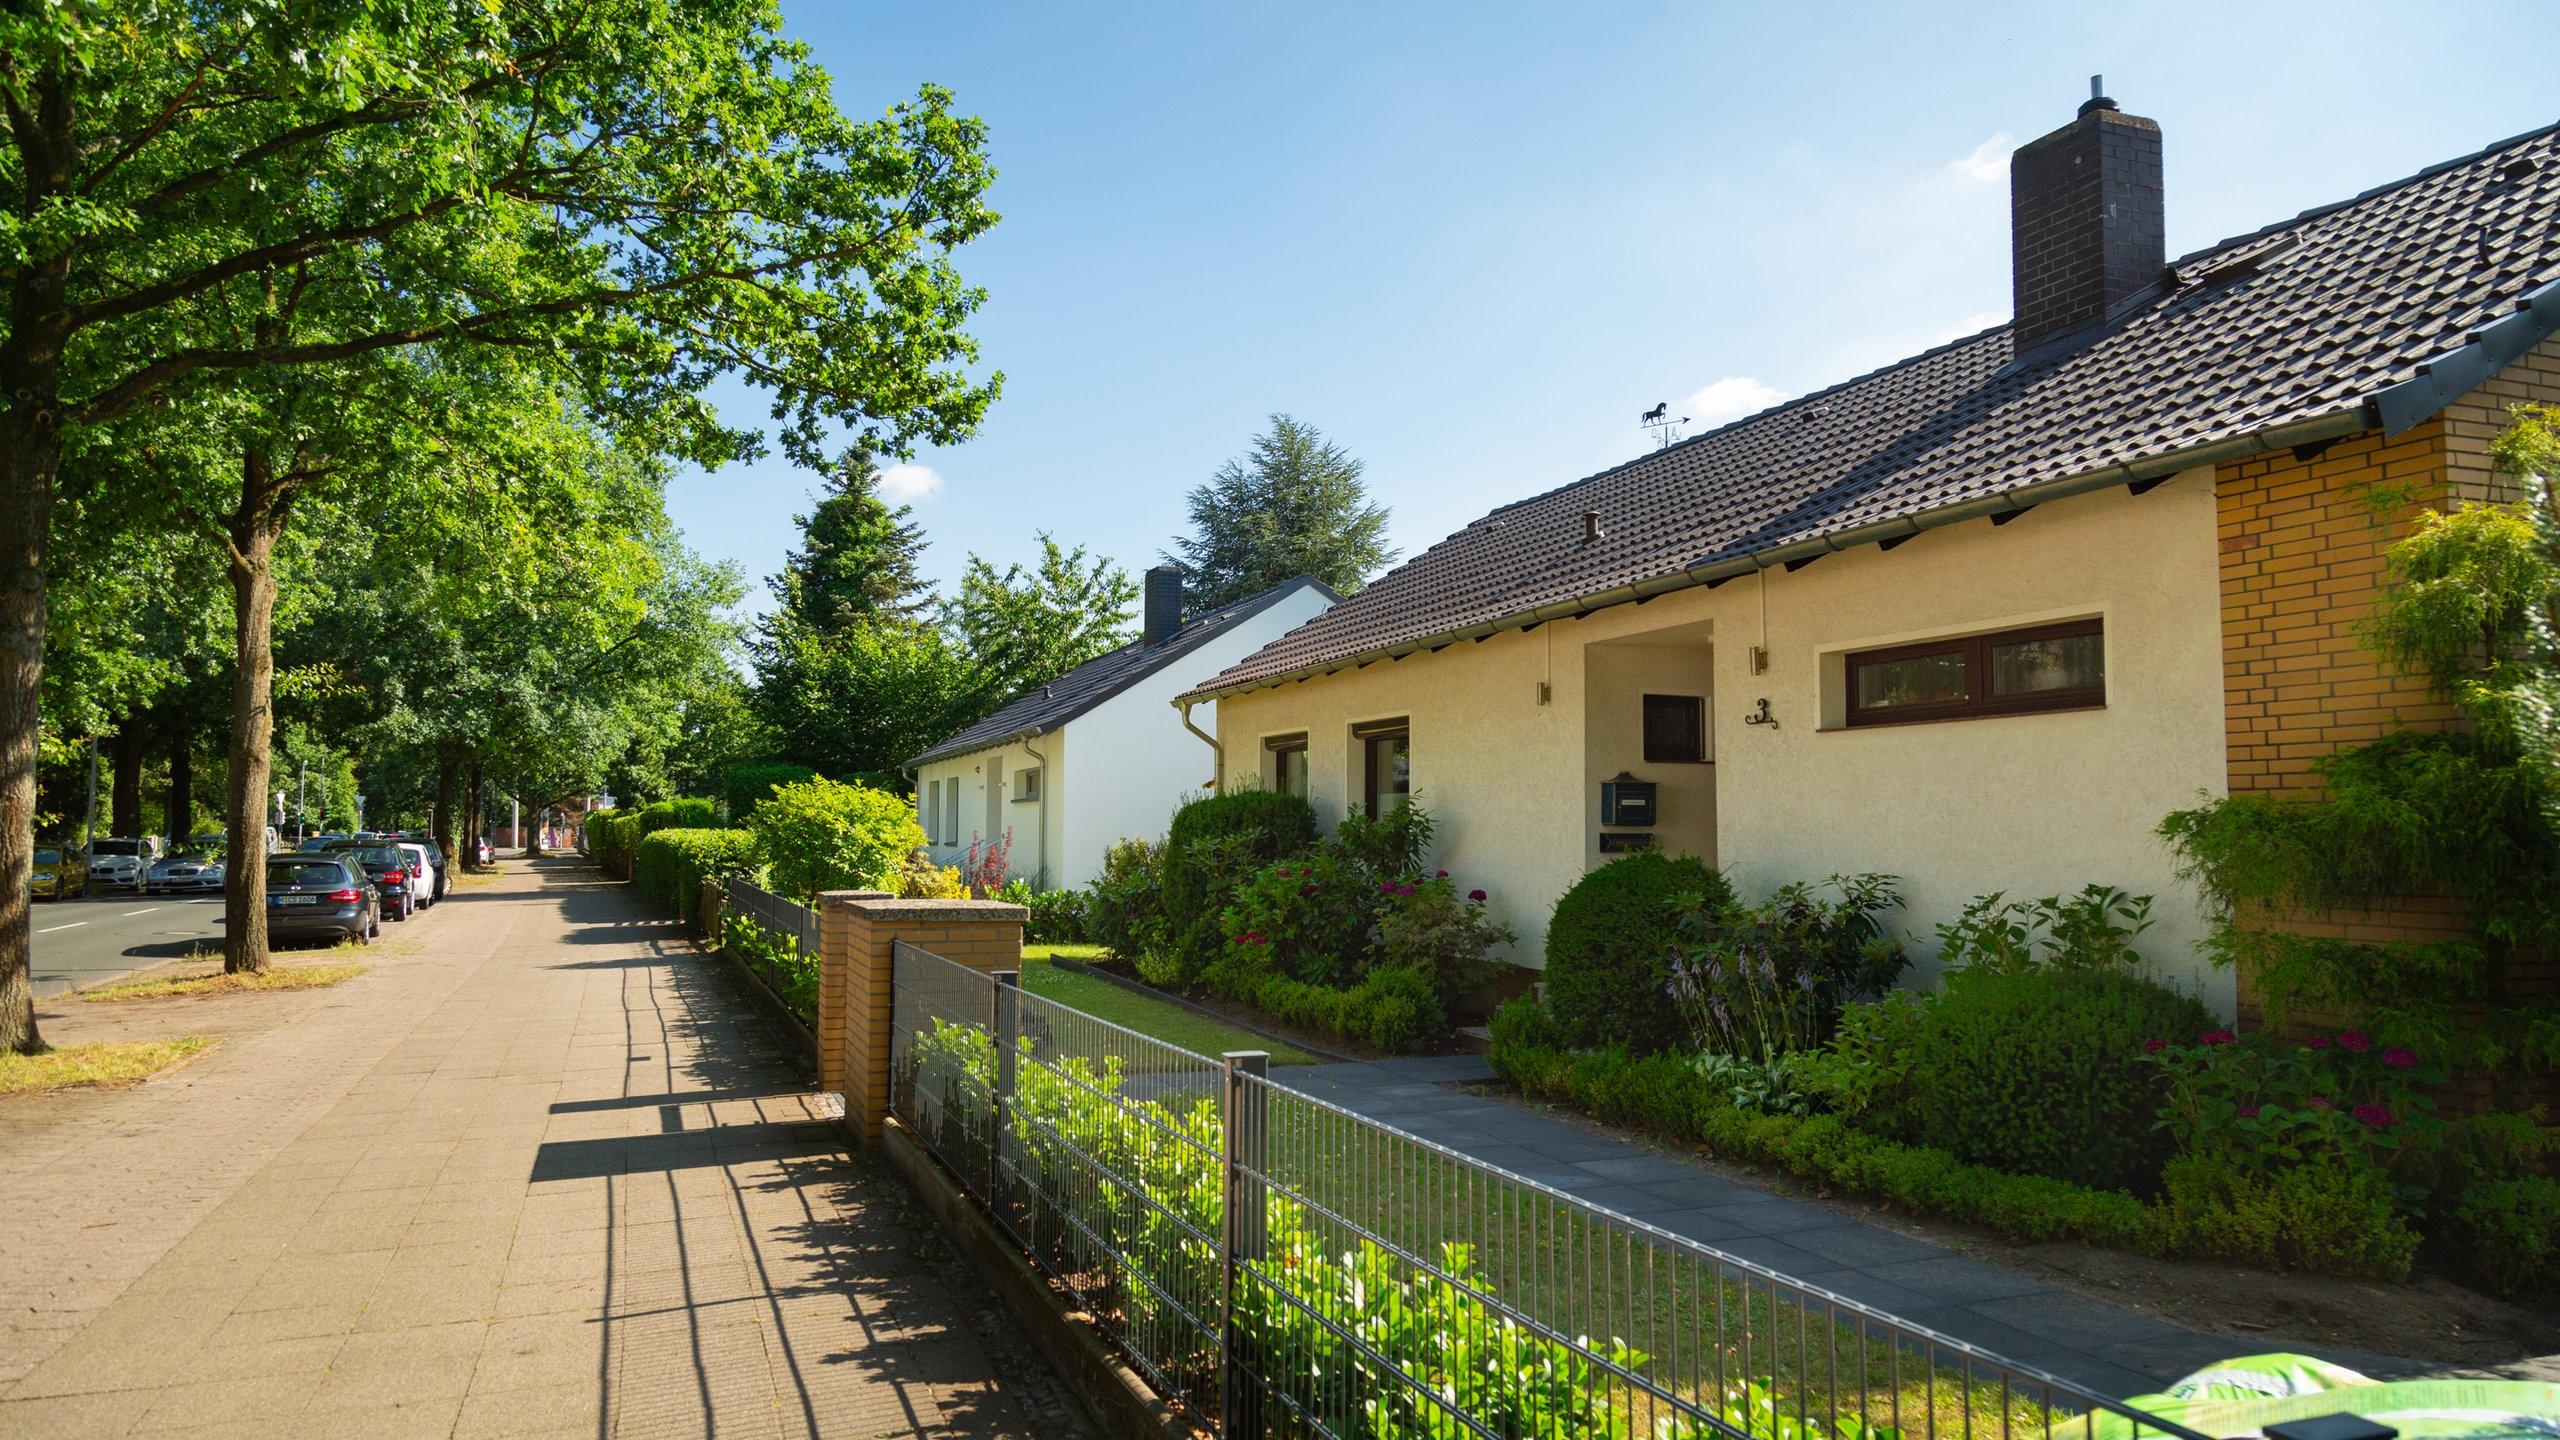 Bothfeld, Hannover, Lower Saxony, Germany